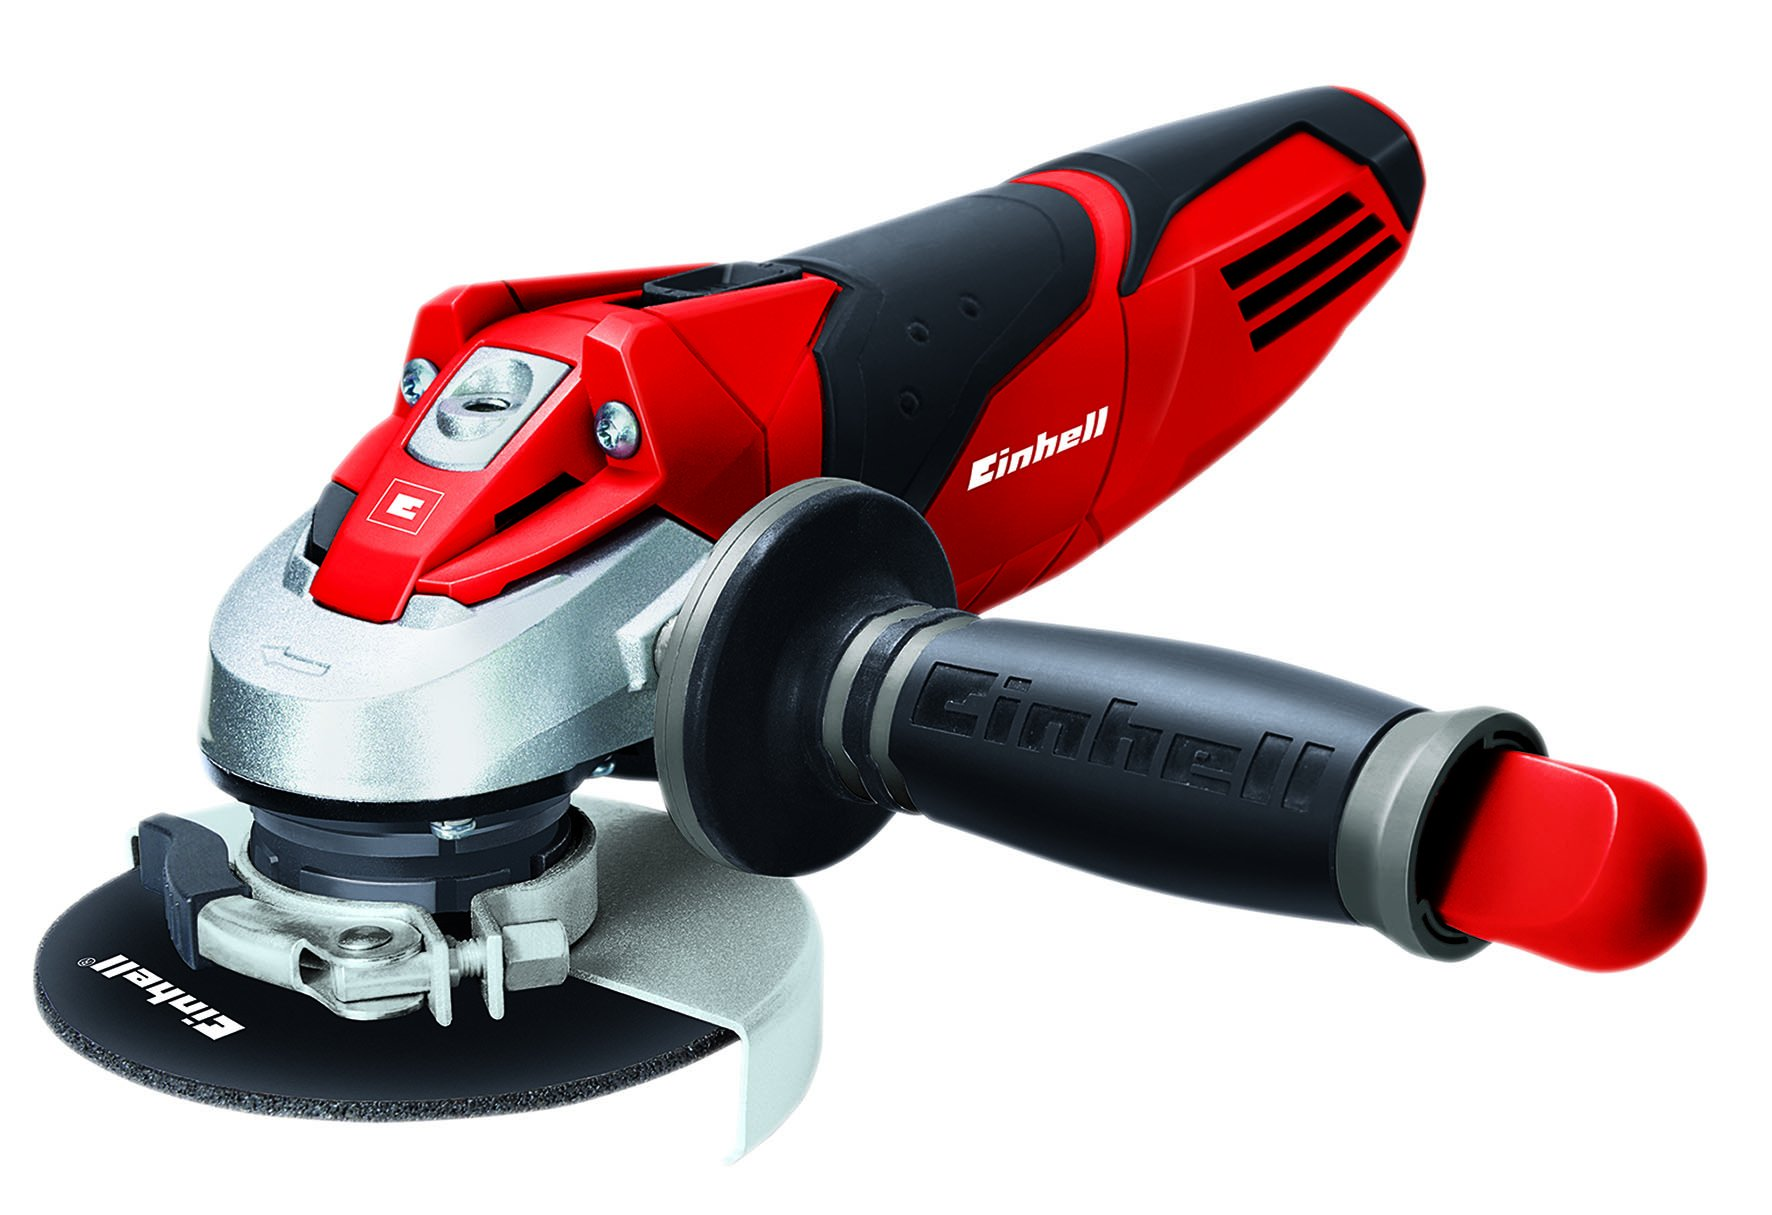 Einhell TE-AG 115/600 -Amoladora Expert , 600 W, 230 V